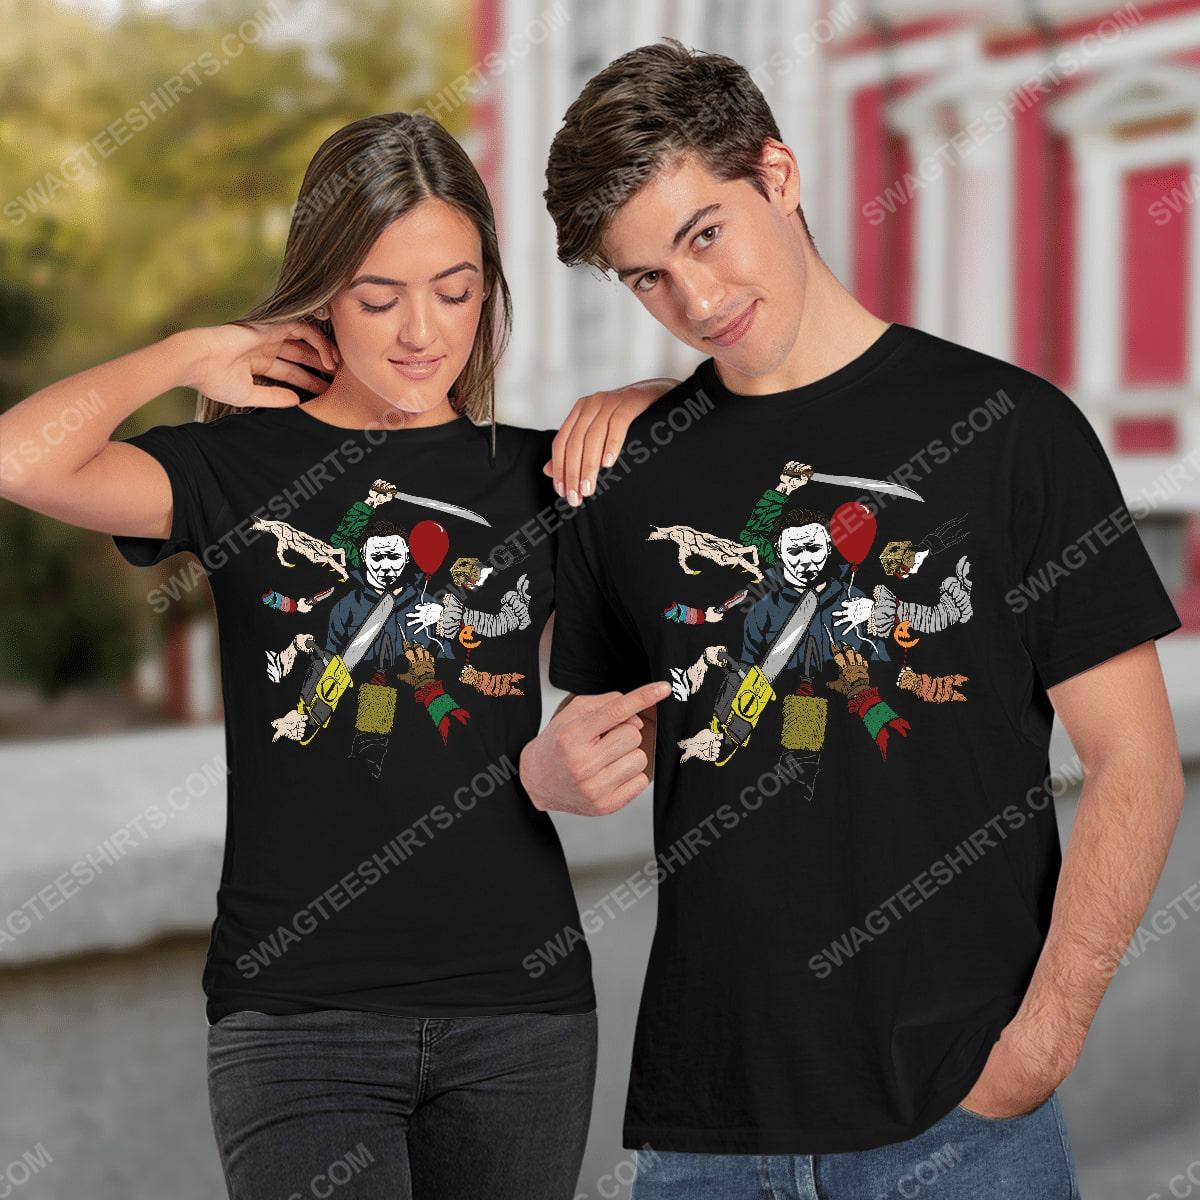 John wick and michael myers hallowick shirt 2(1)